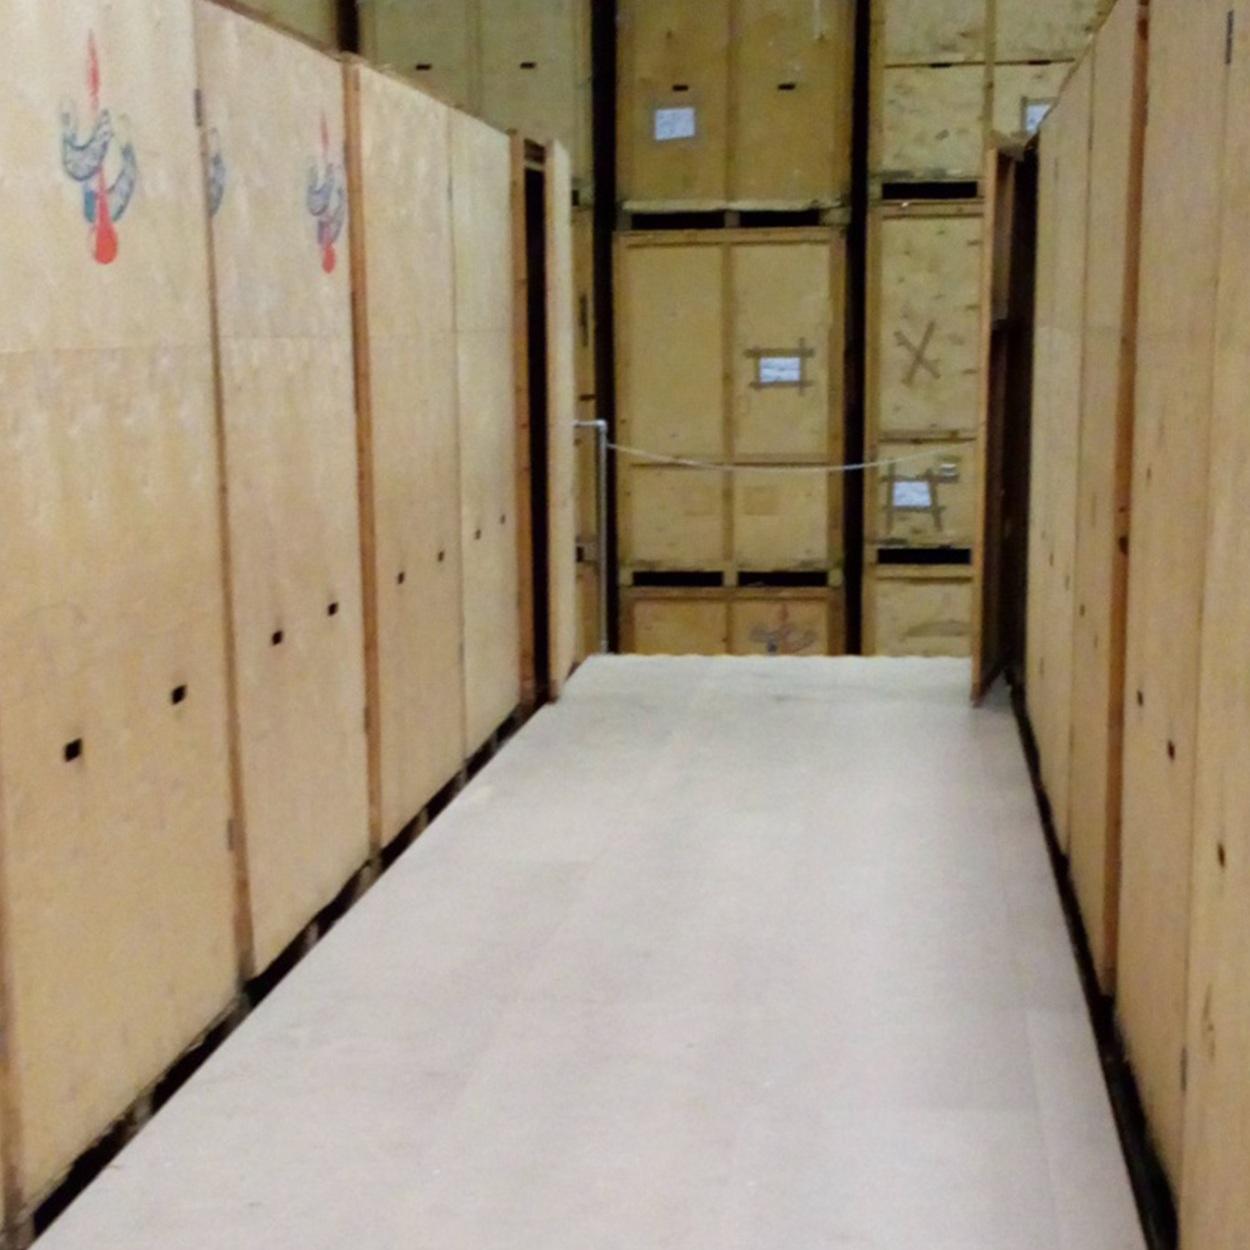 storage-units-in-oxford.jpg